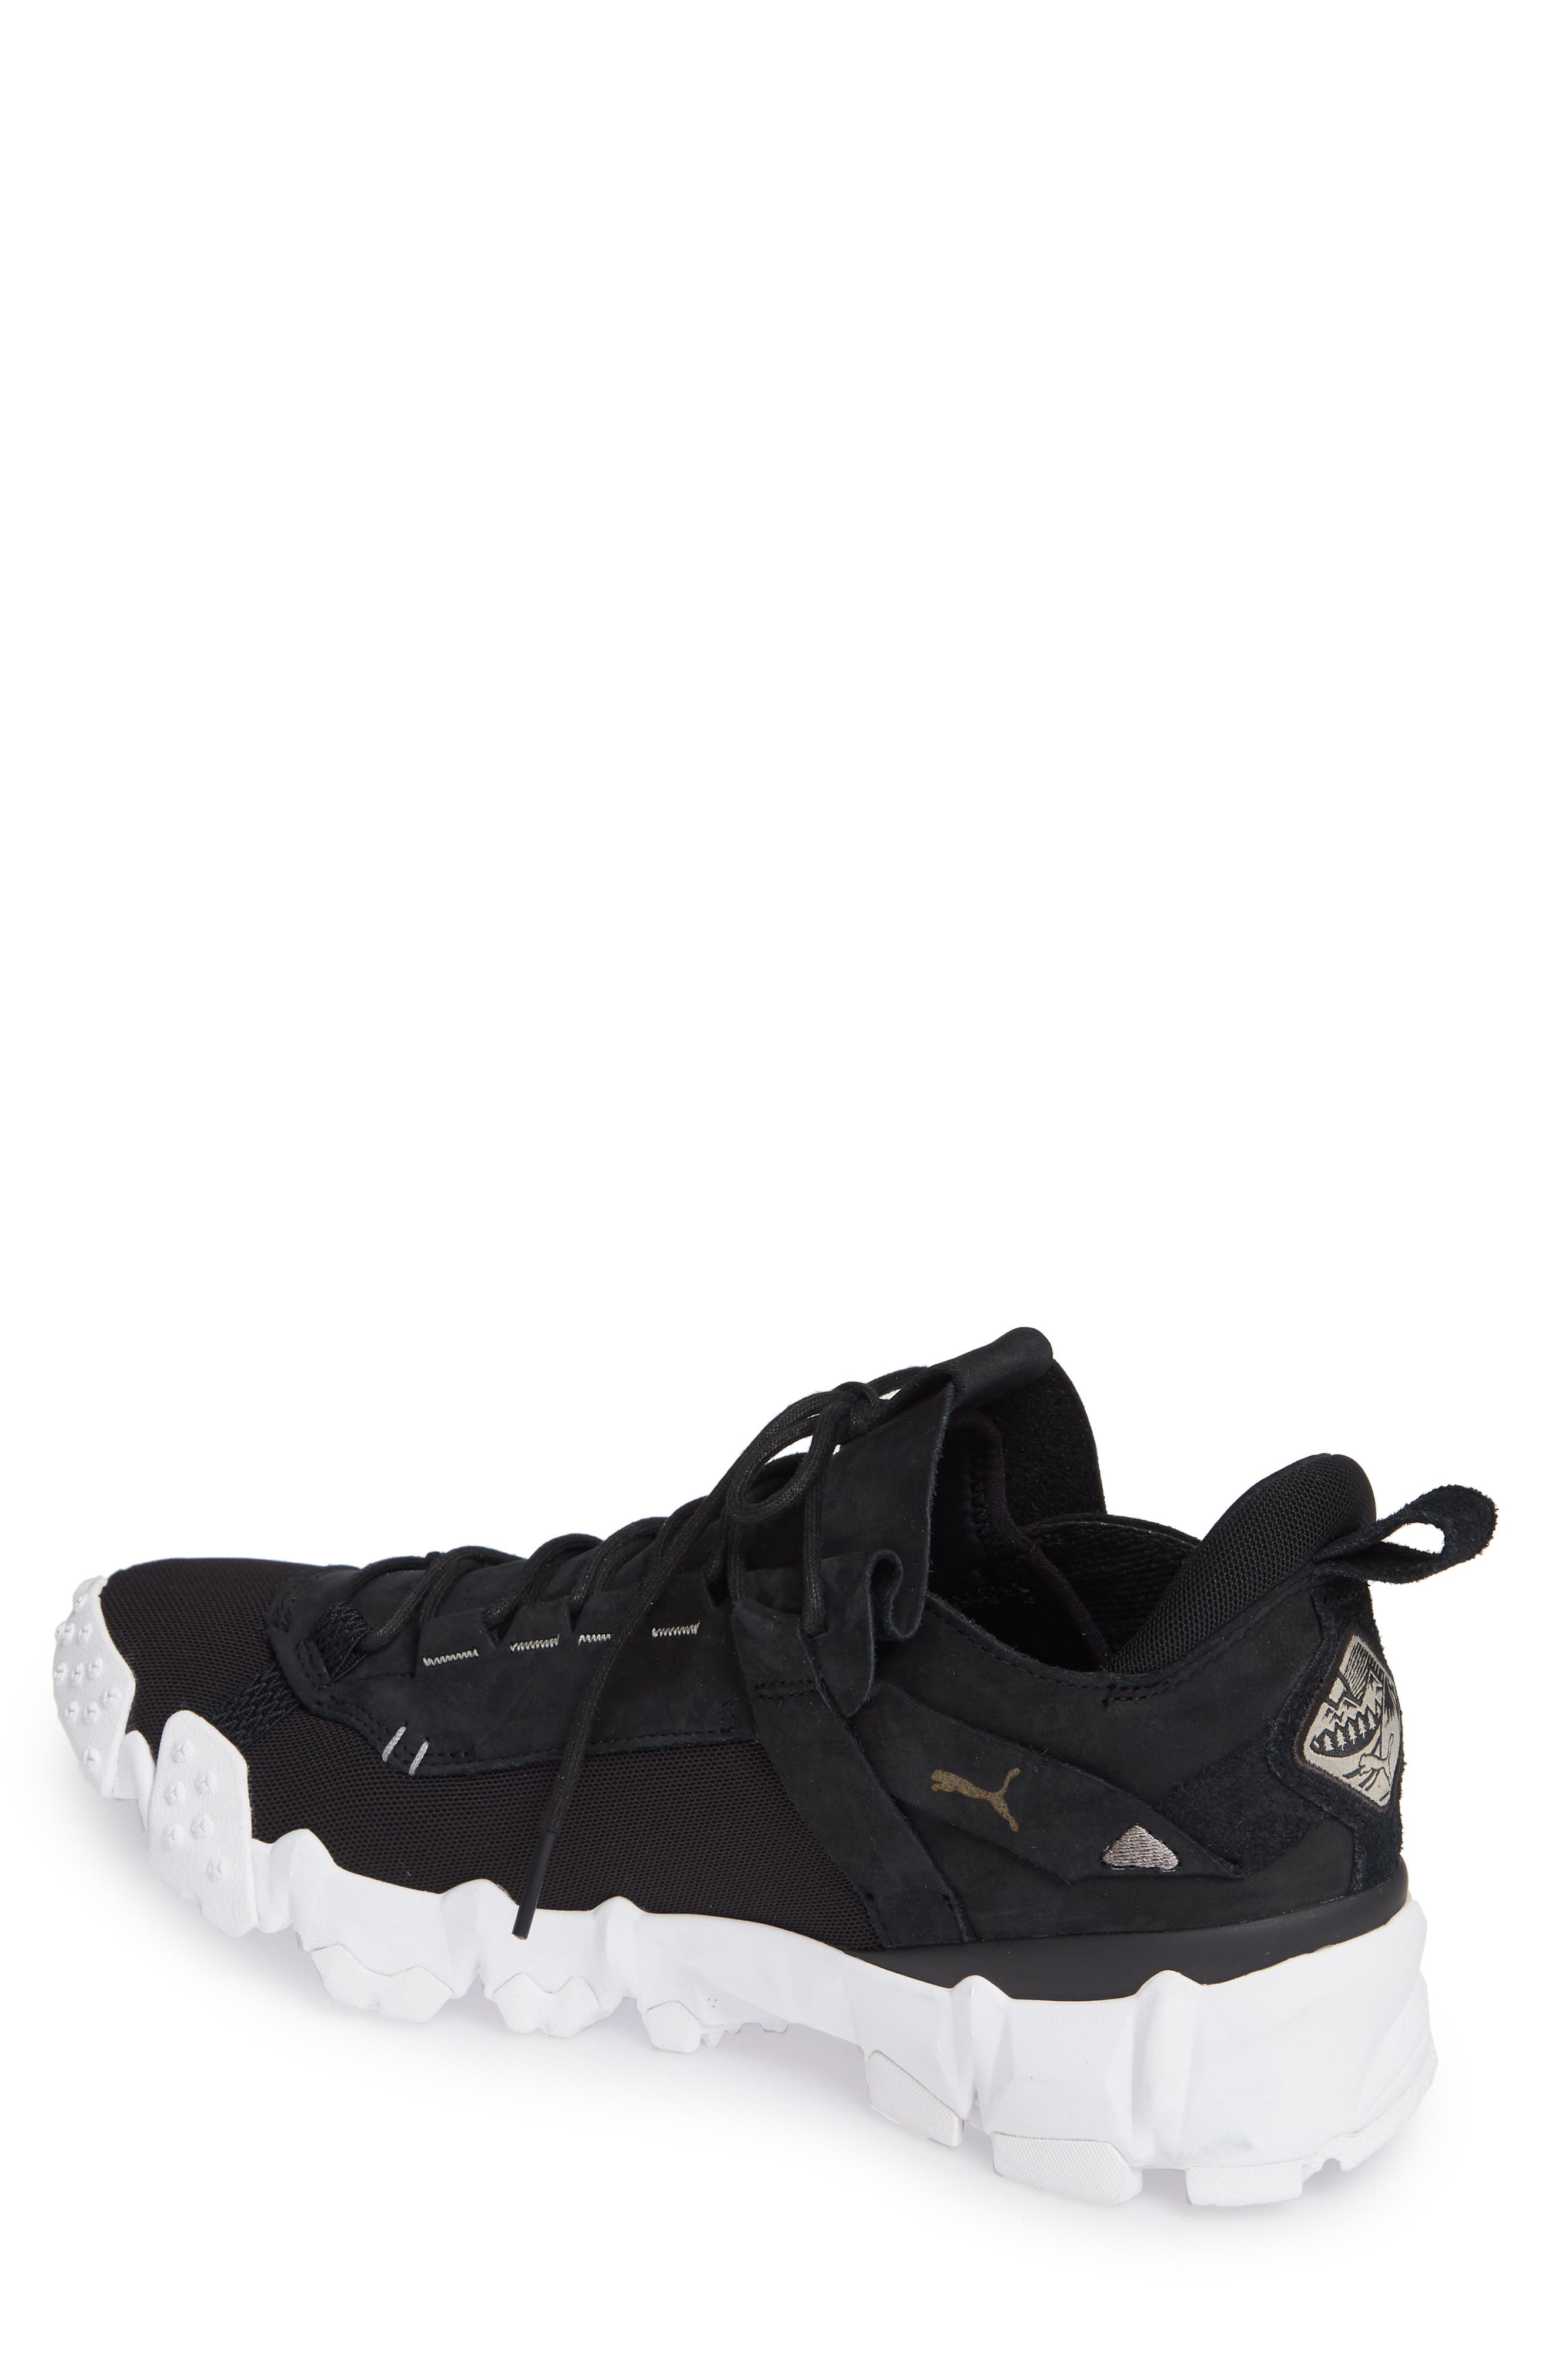 Trailfox Sneaker,                             Alternate thumbnail 2, color,                             BLACK/ WHITE